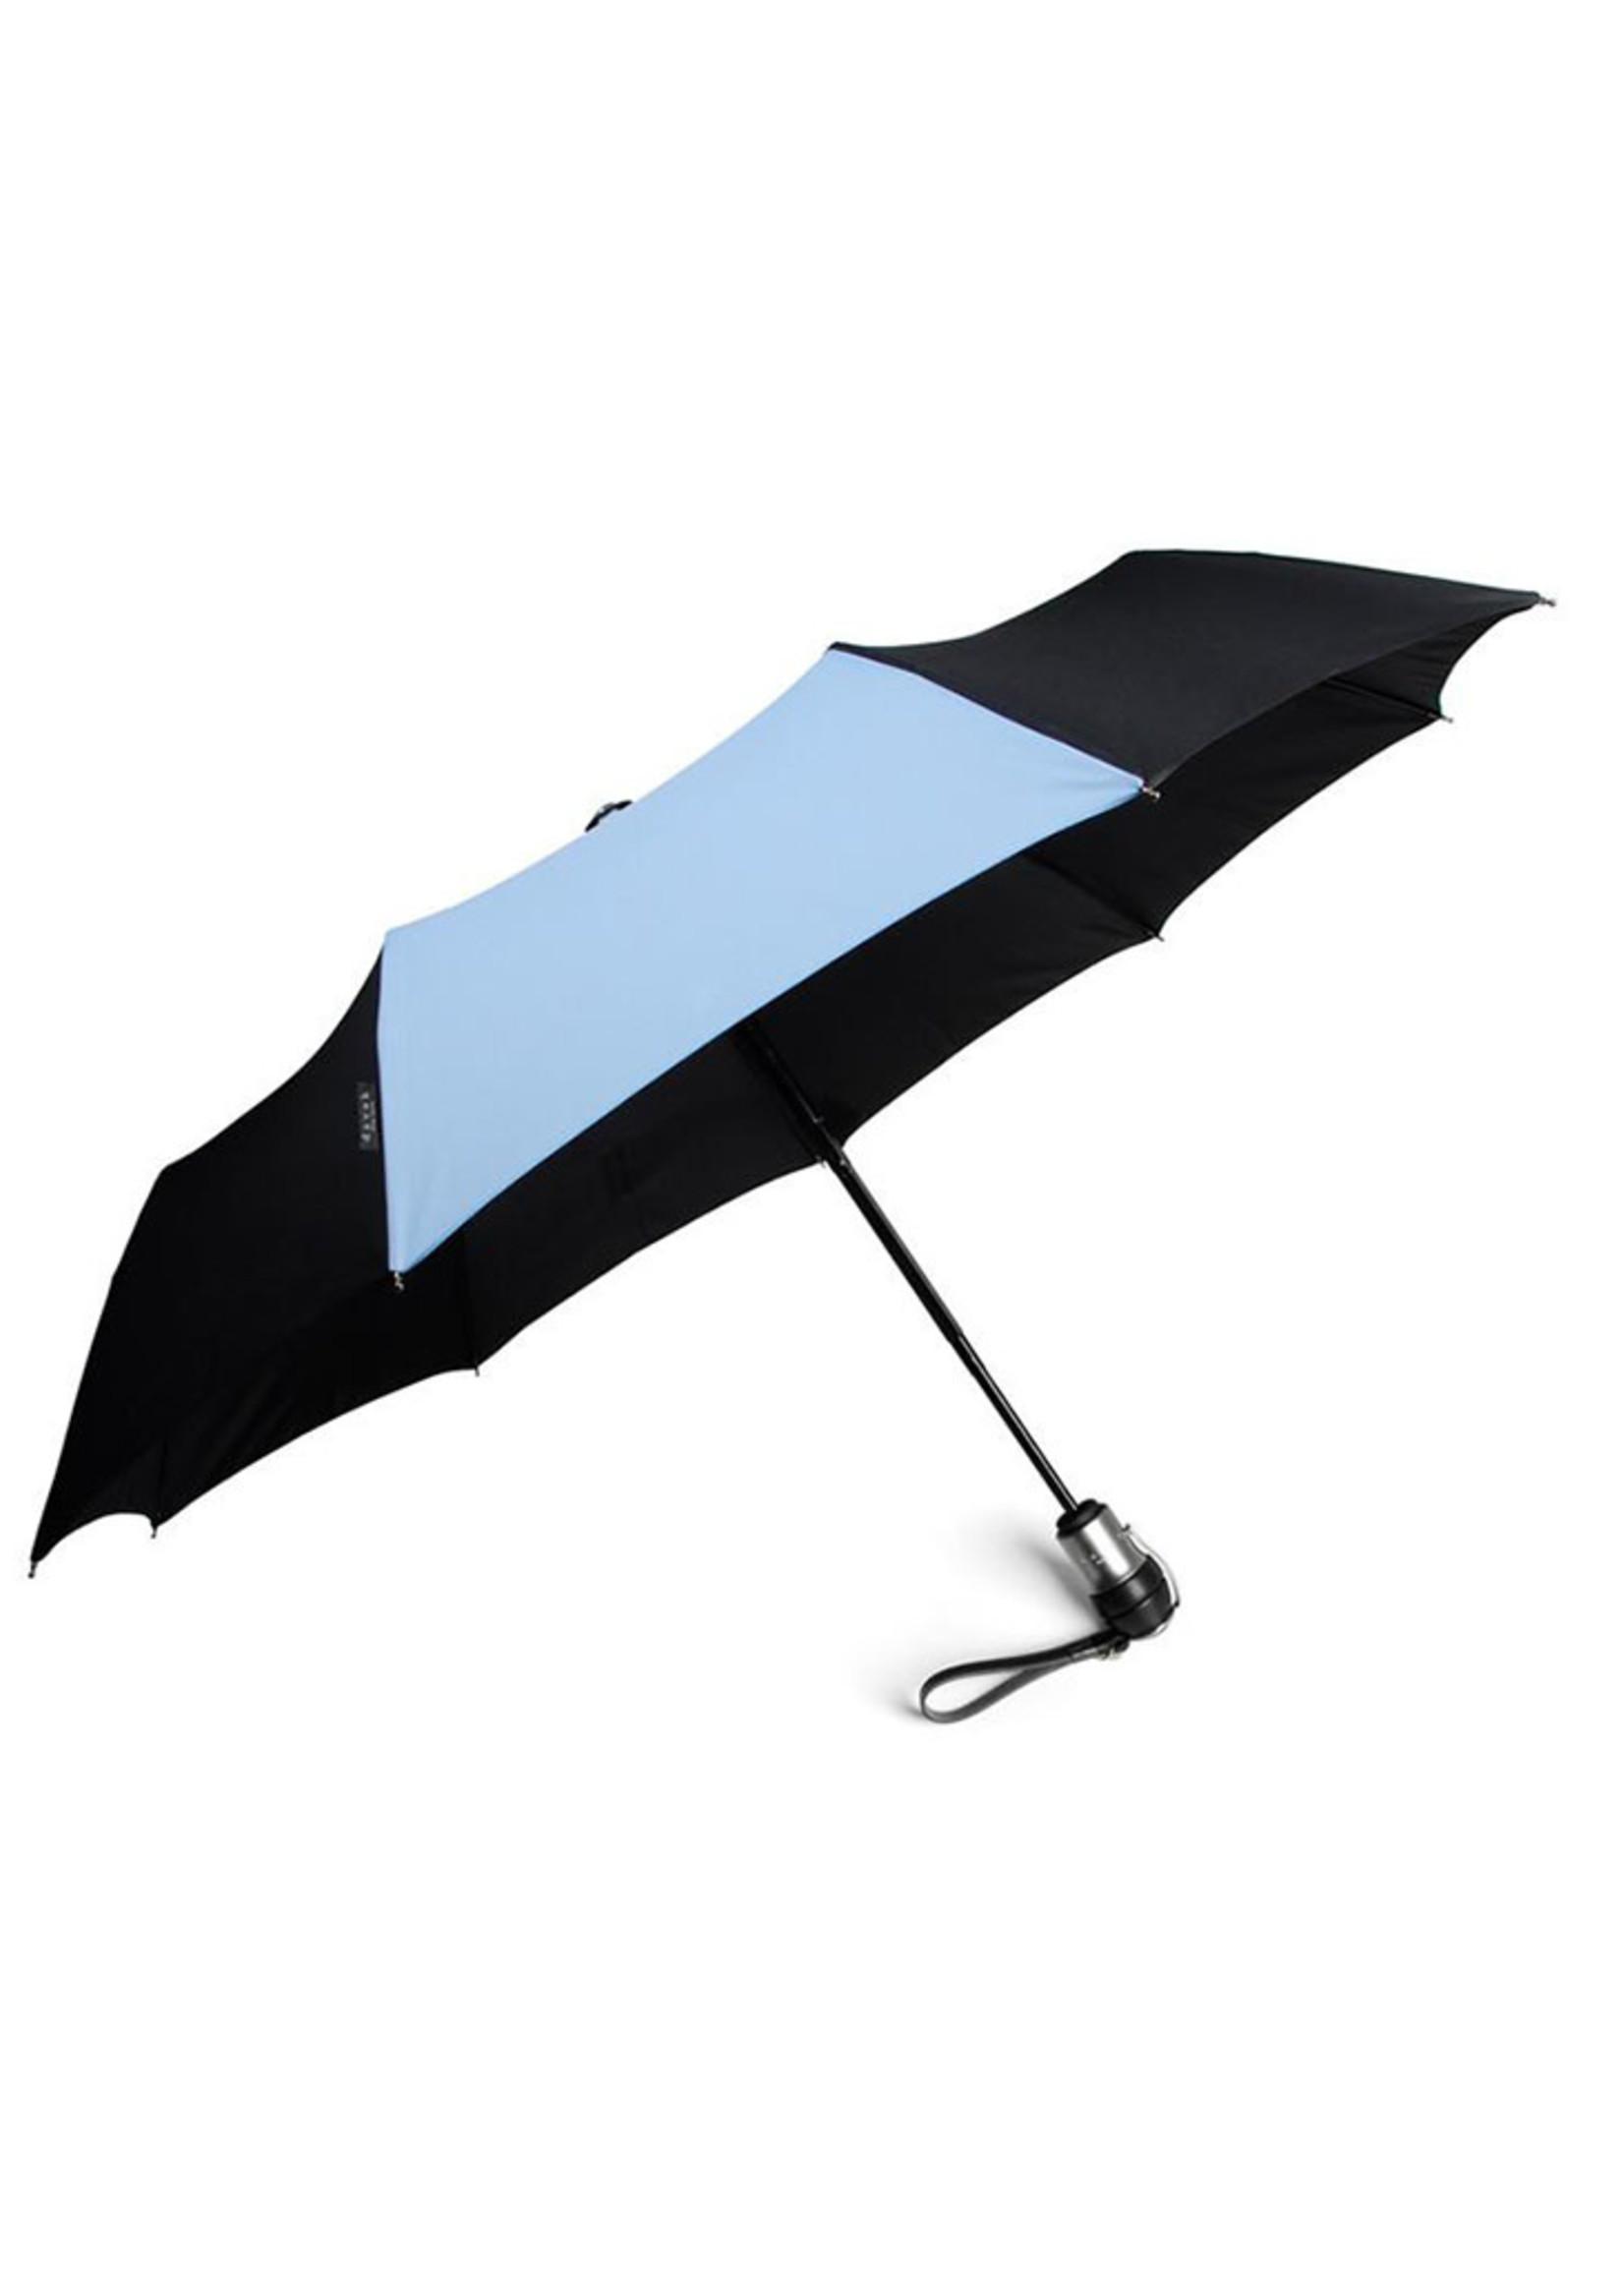 Davek Solo Umbrella Pale Blue